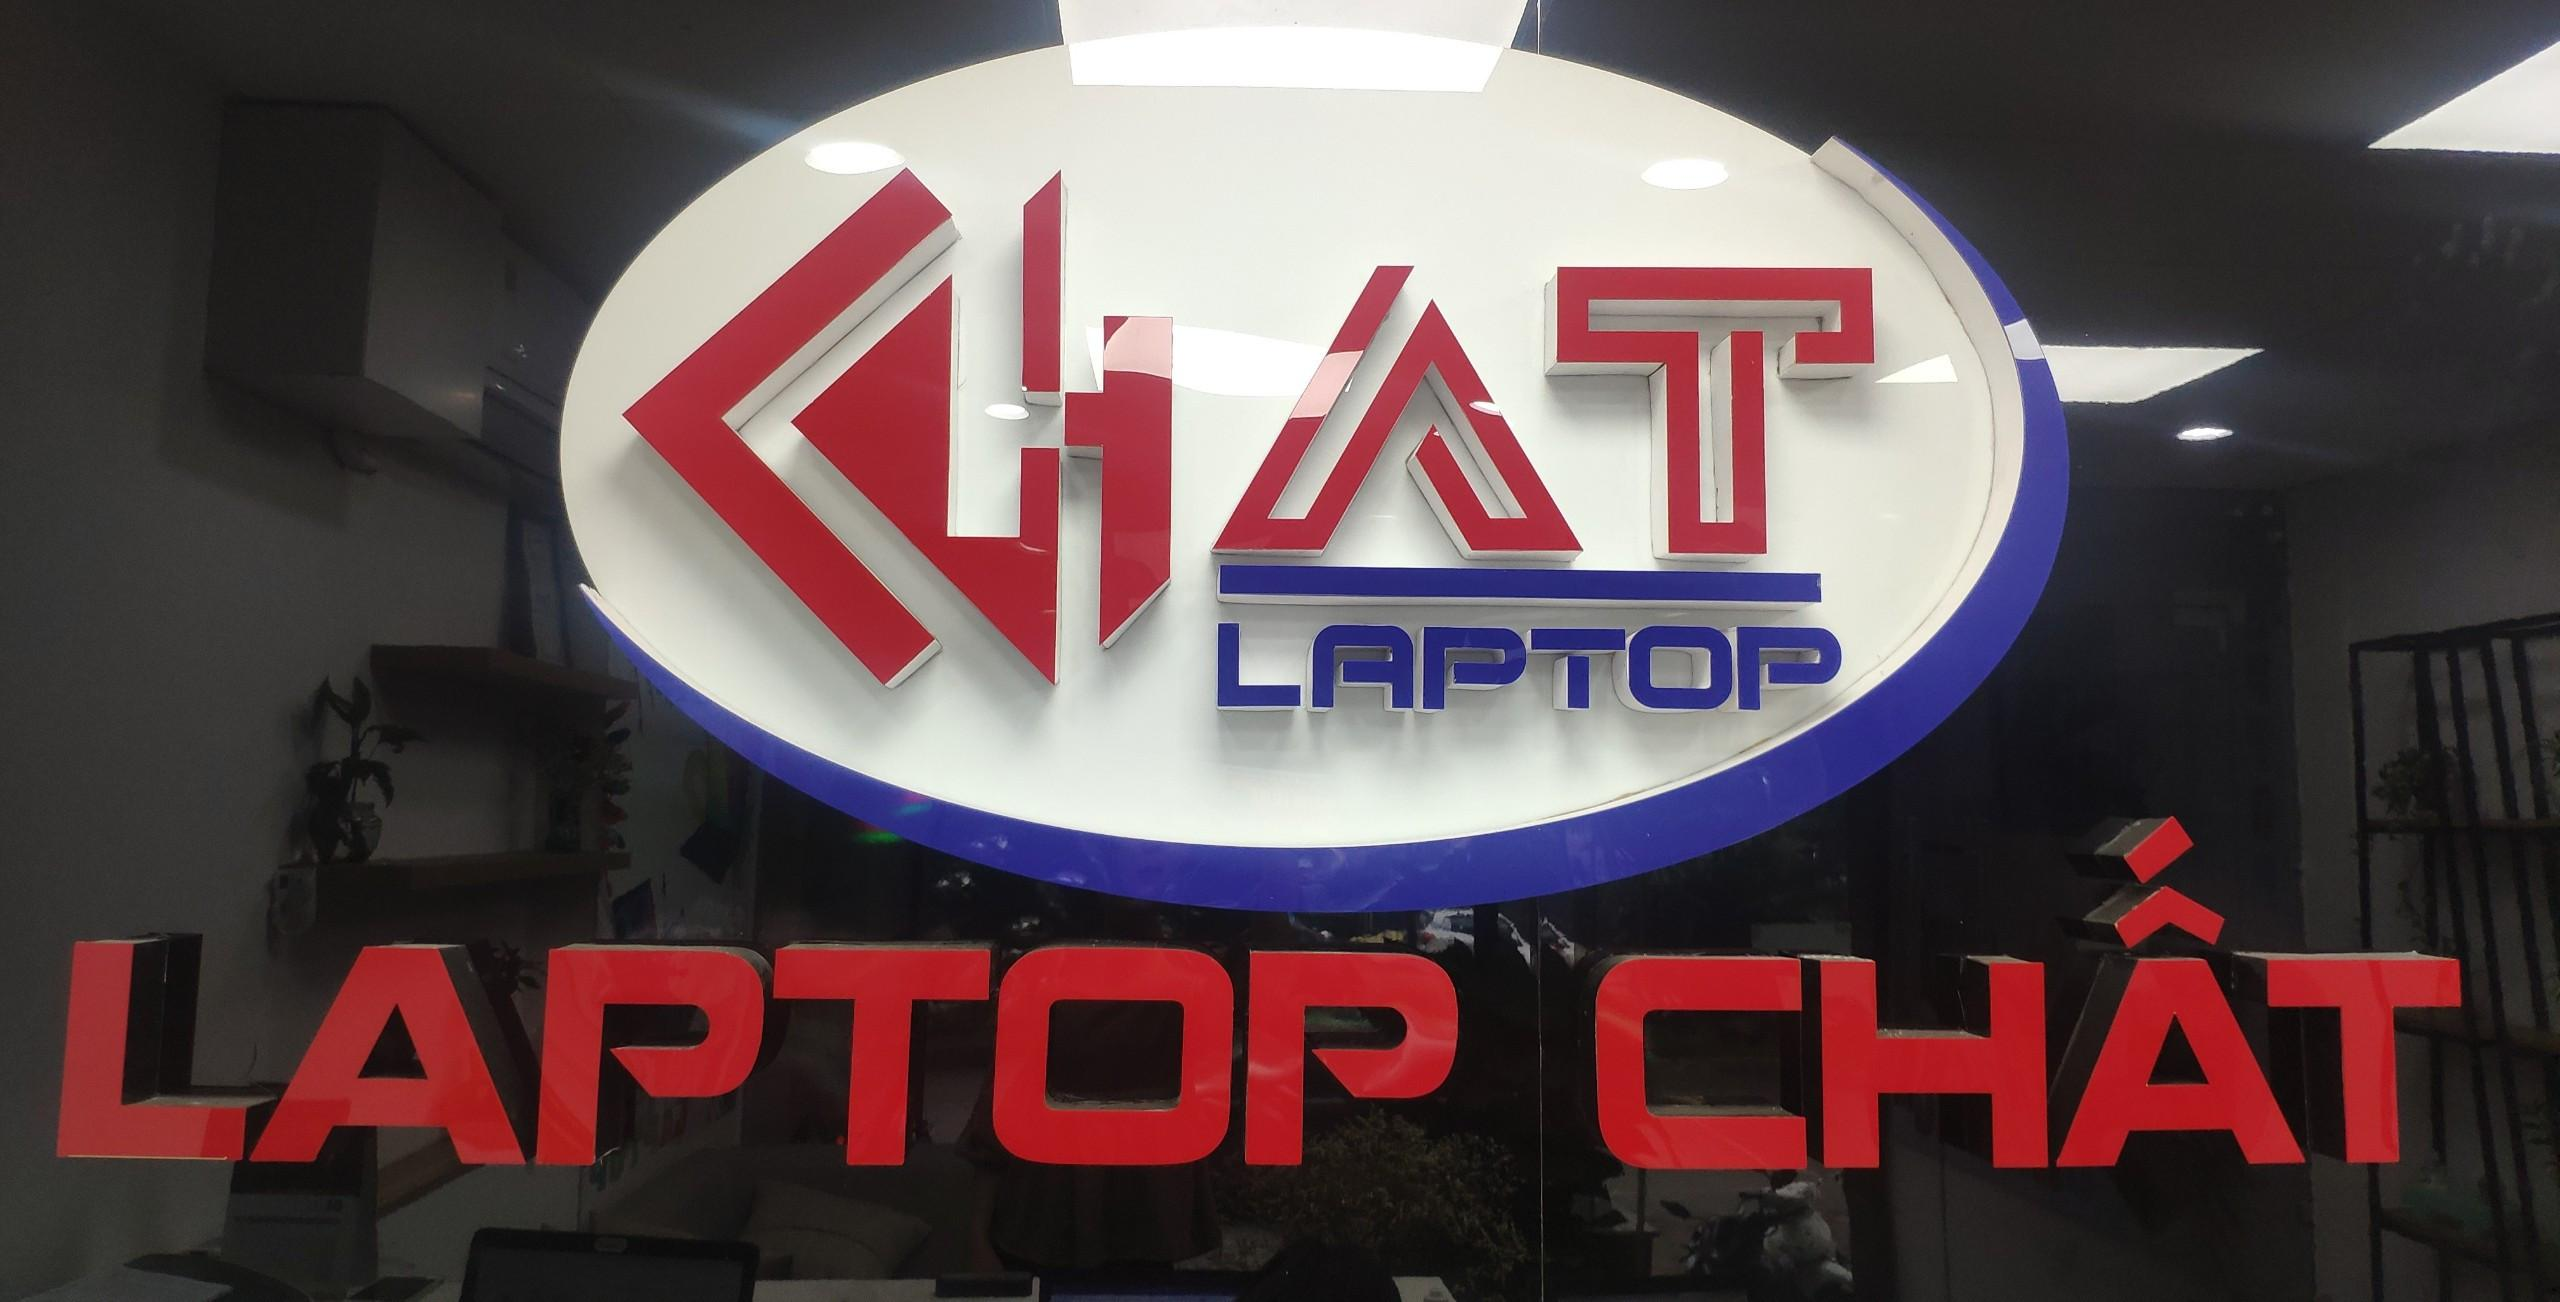 laptop-chat-lua-dao